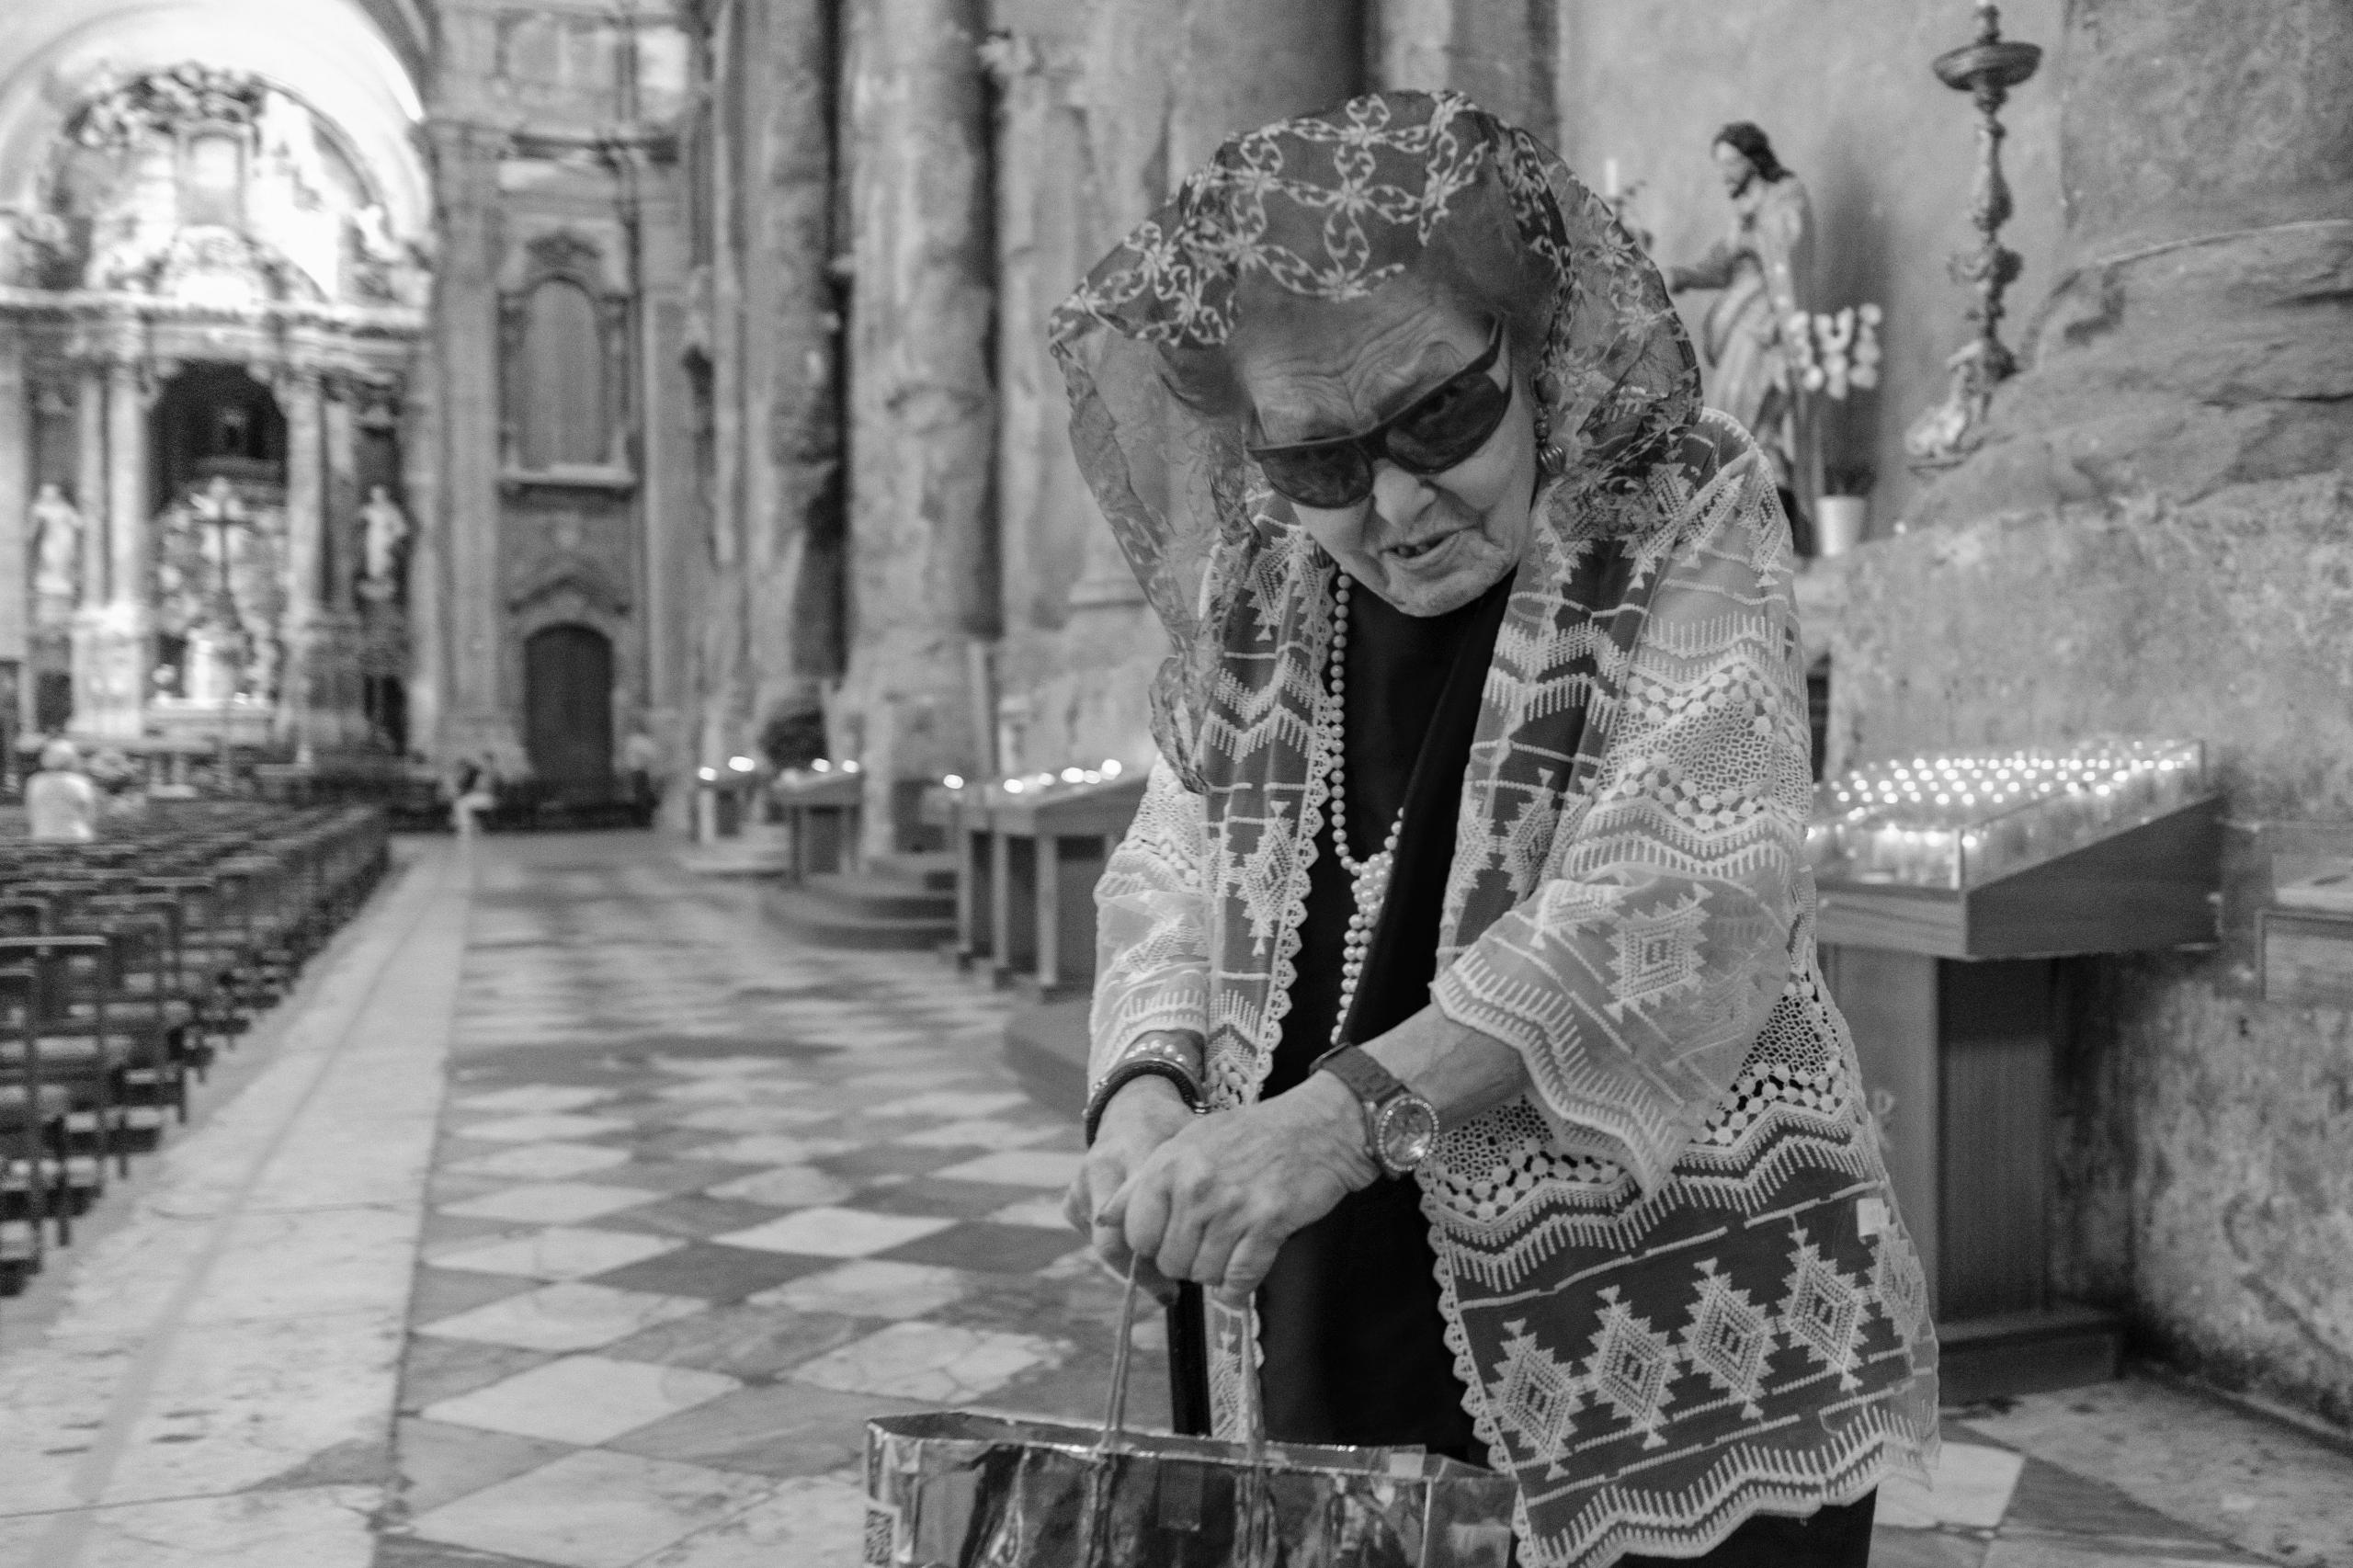 Church Lady Lisboa, Portugal - giseleduprez | ello